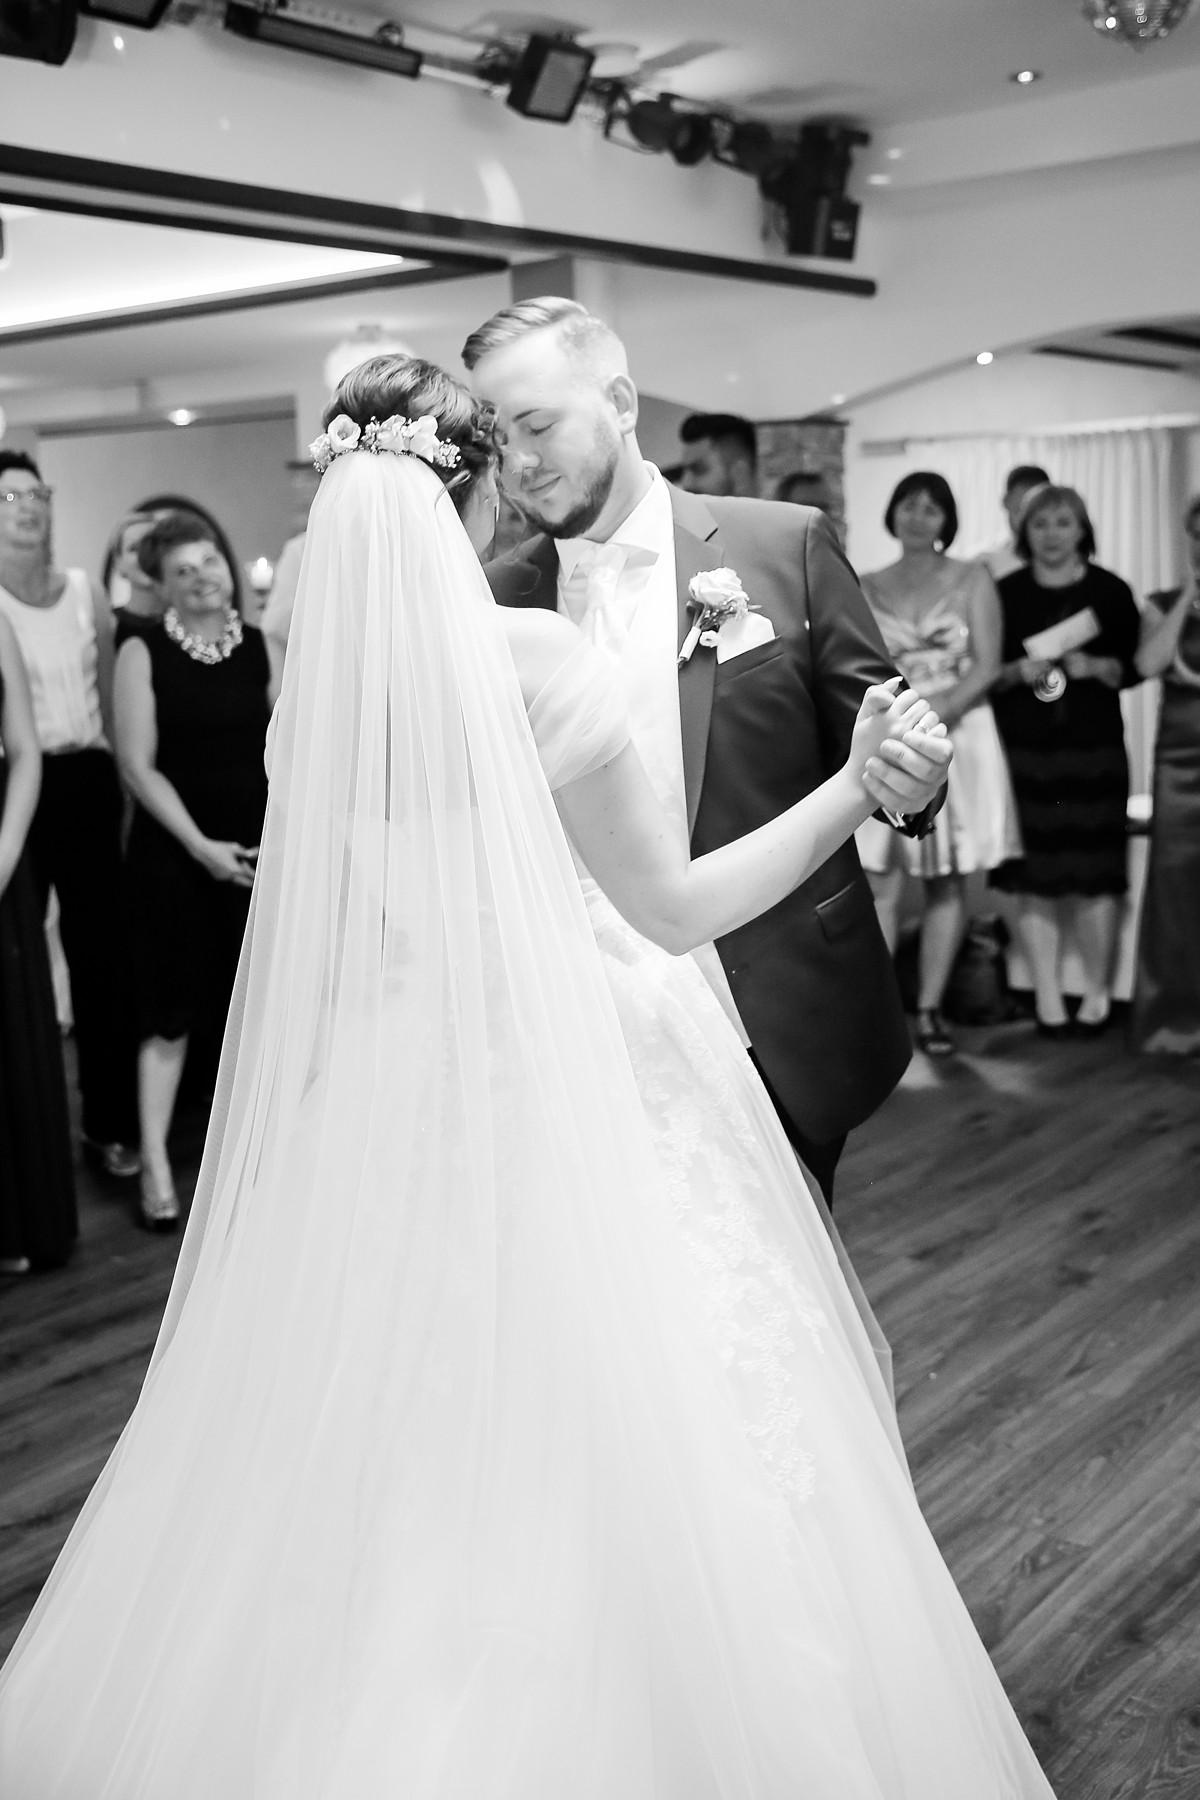 Hochzeitsfotograf-Bünde-Hücker-Moor-Fotograf-Moor-Ranch_0201